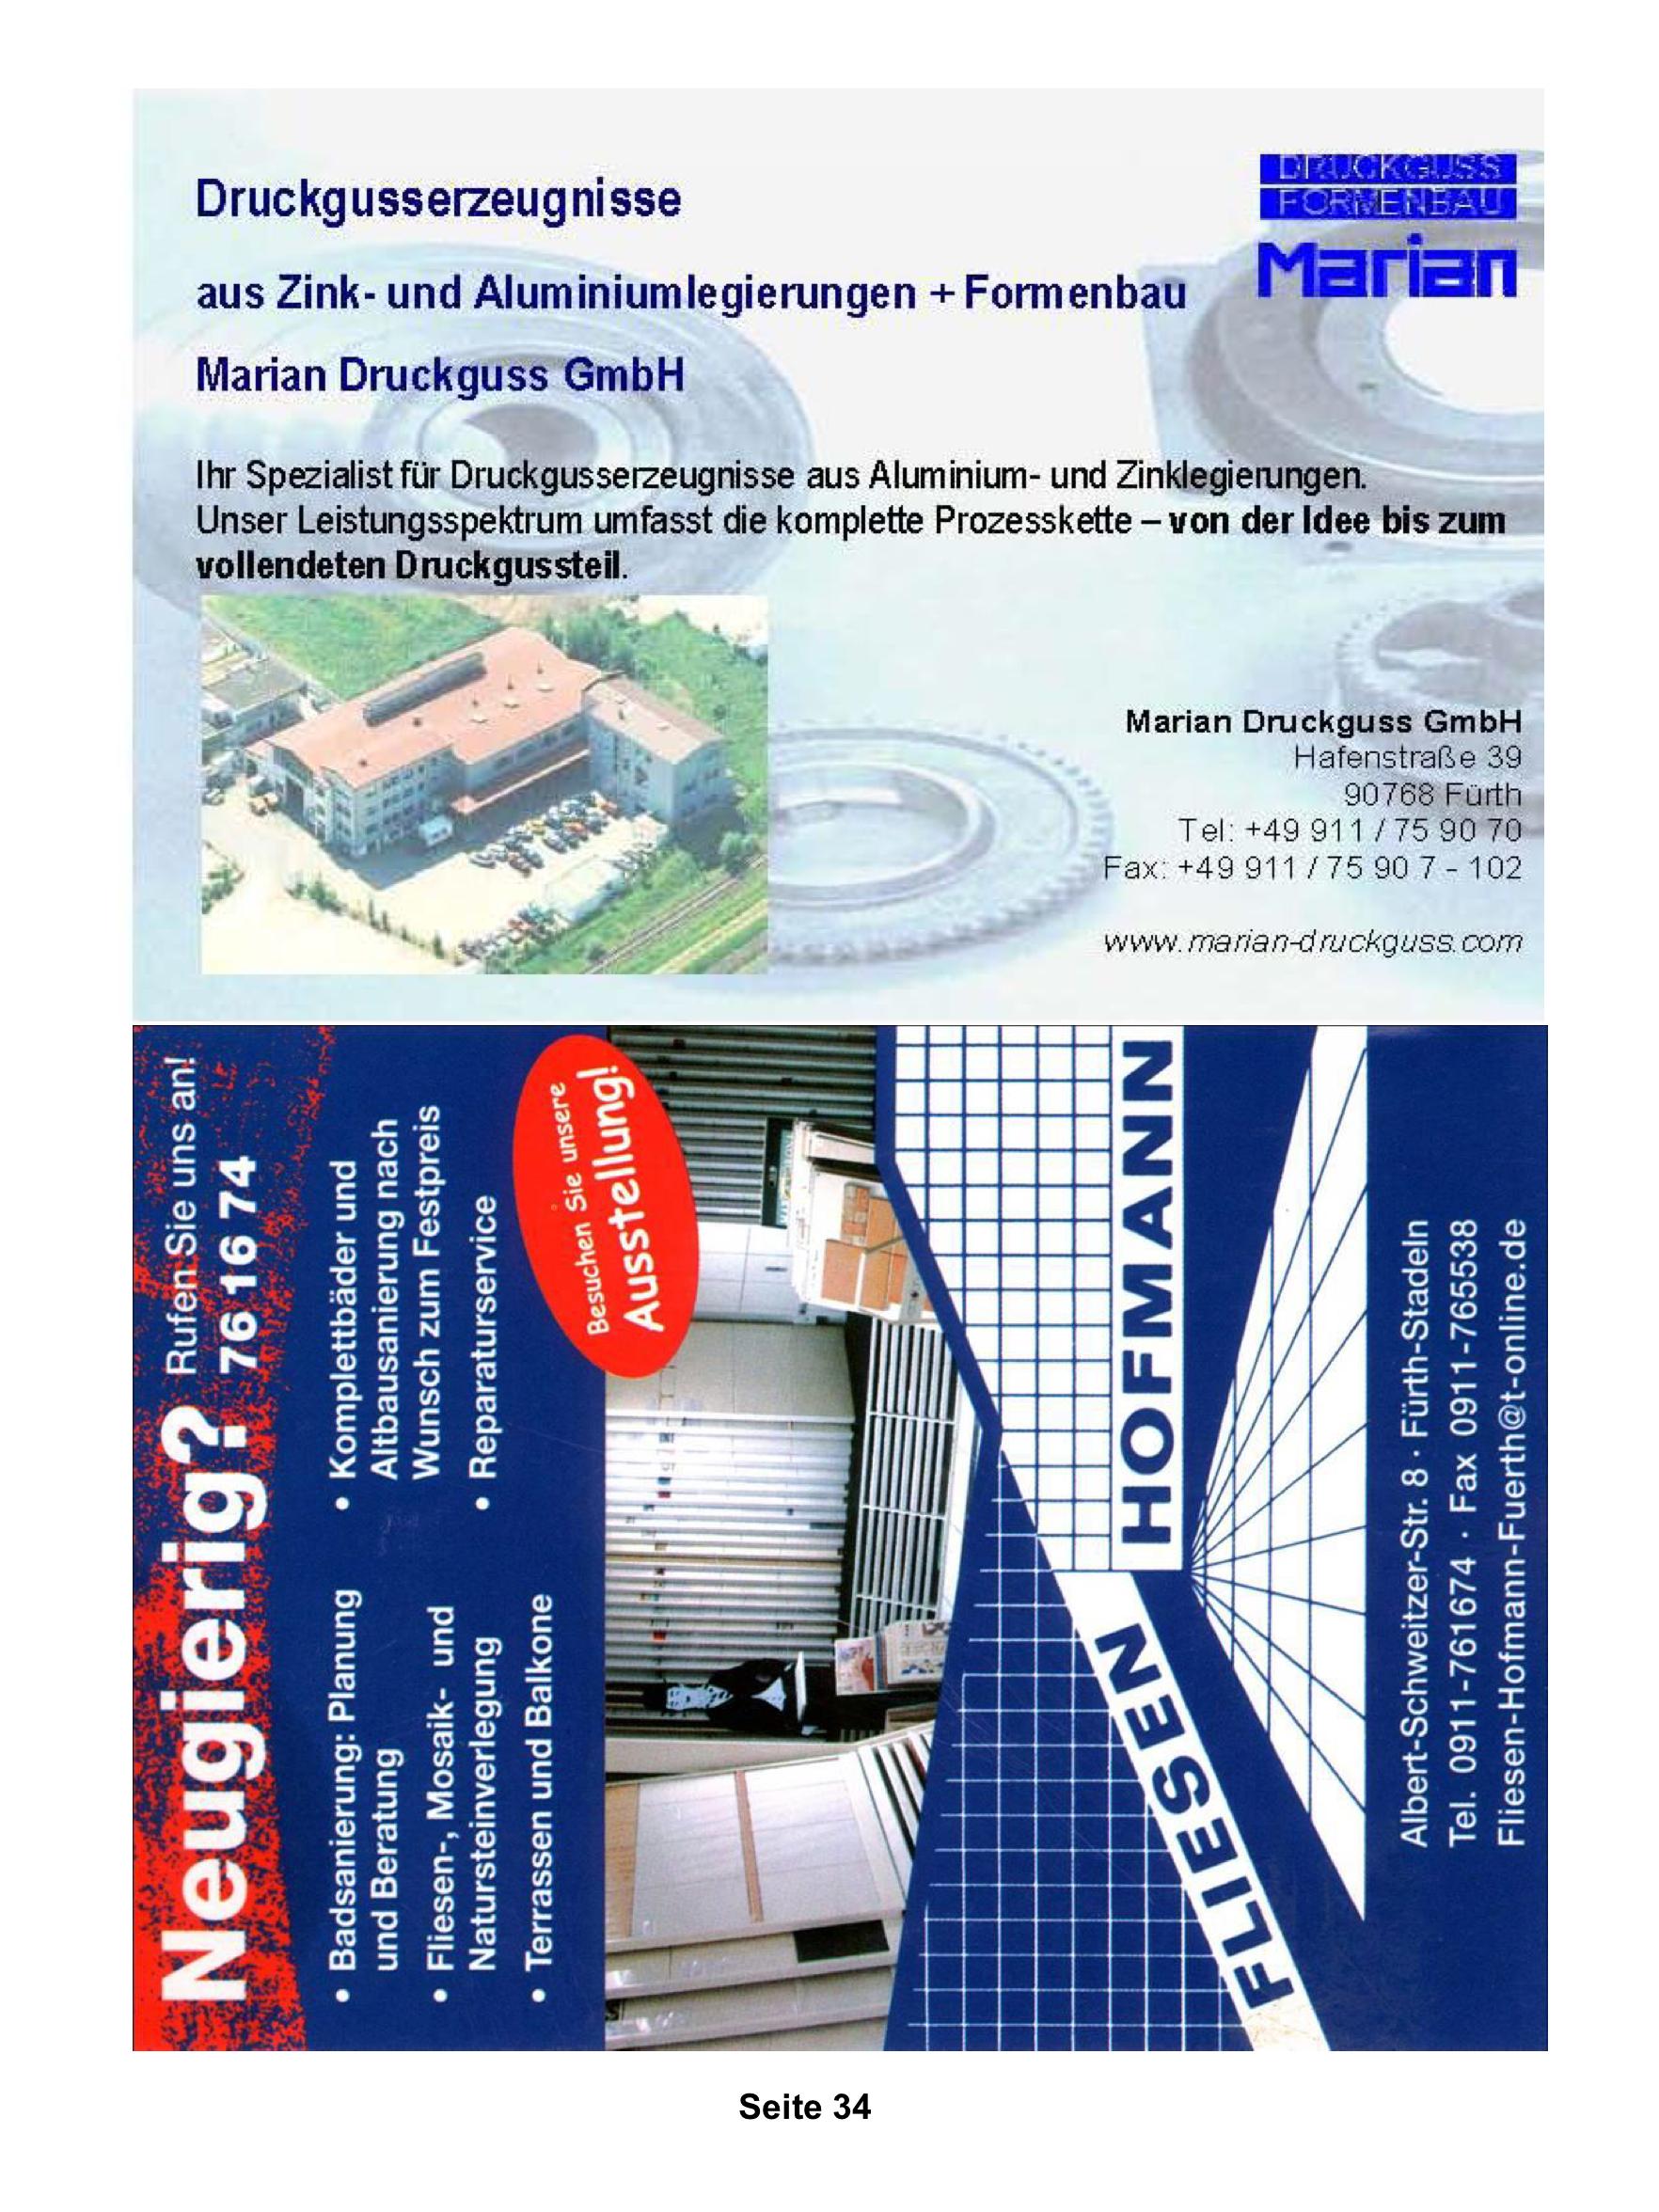 Diepersdorf-34.png